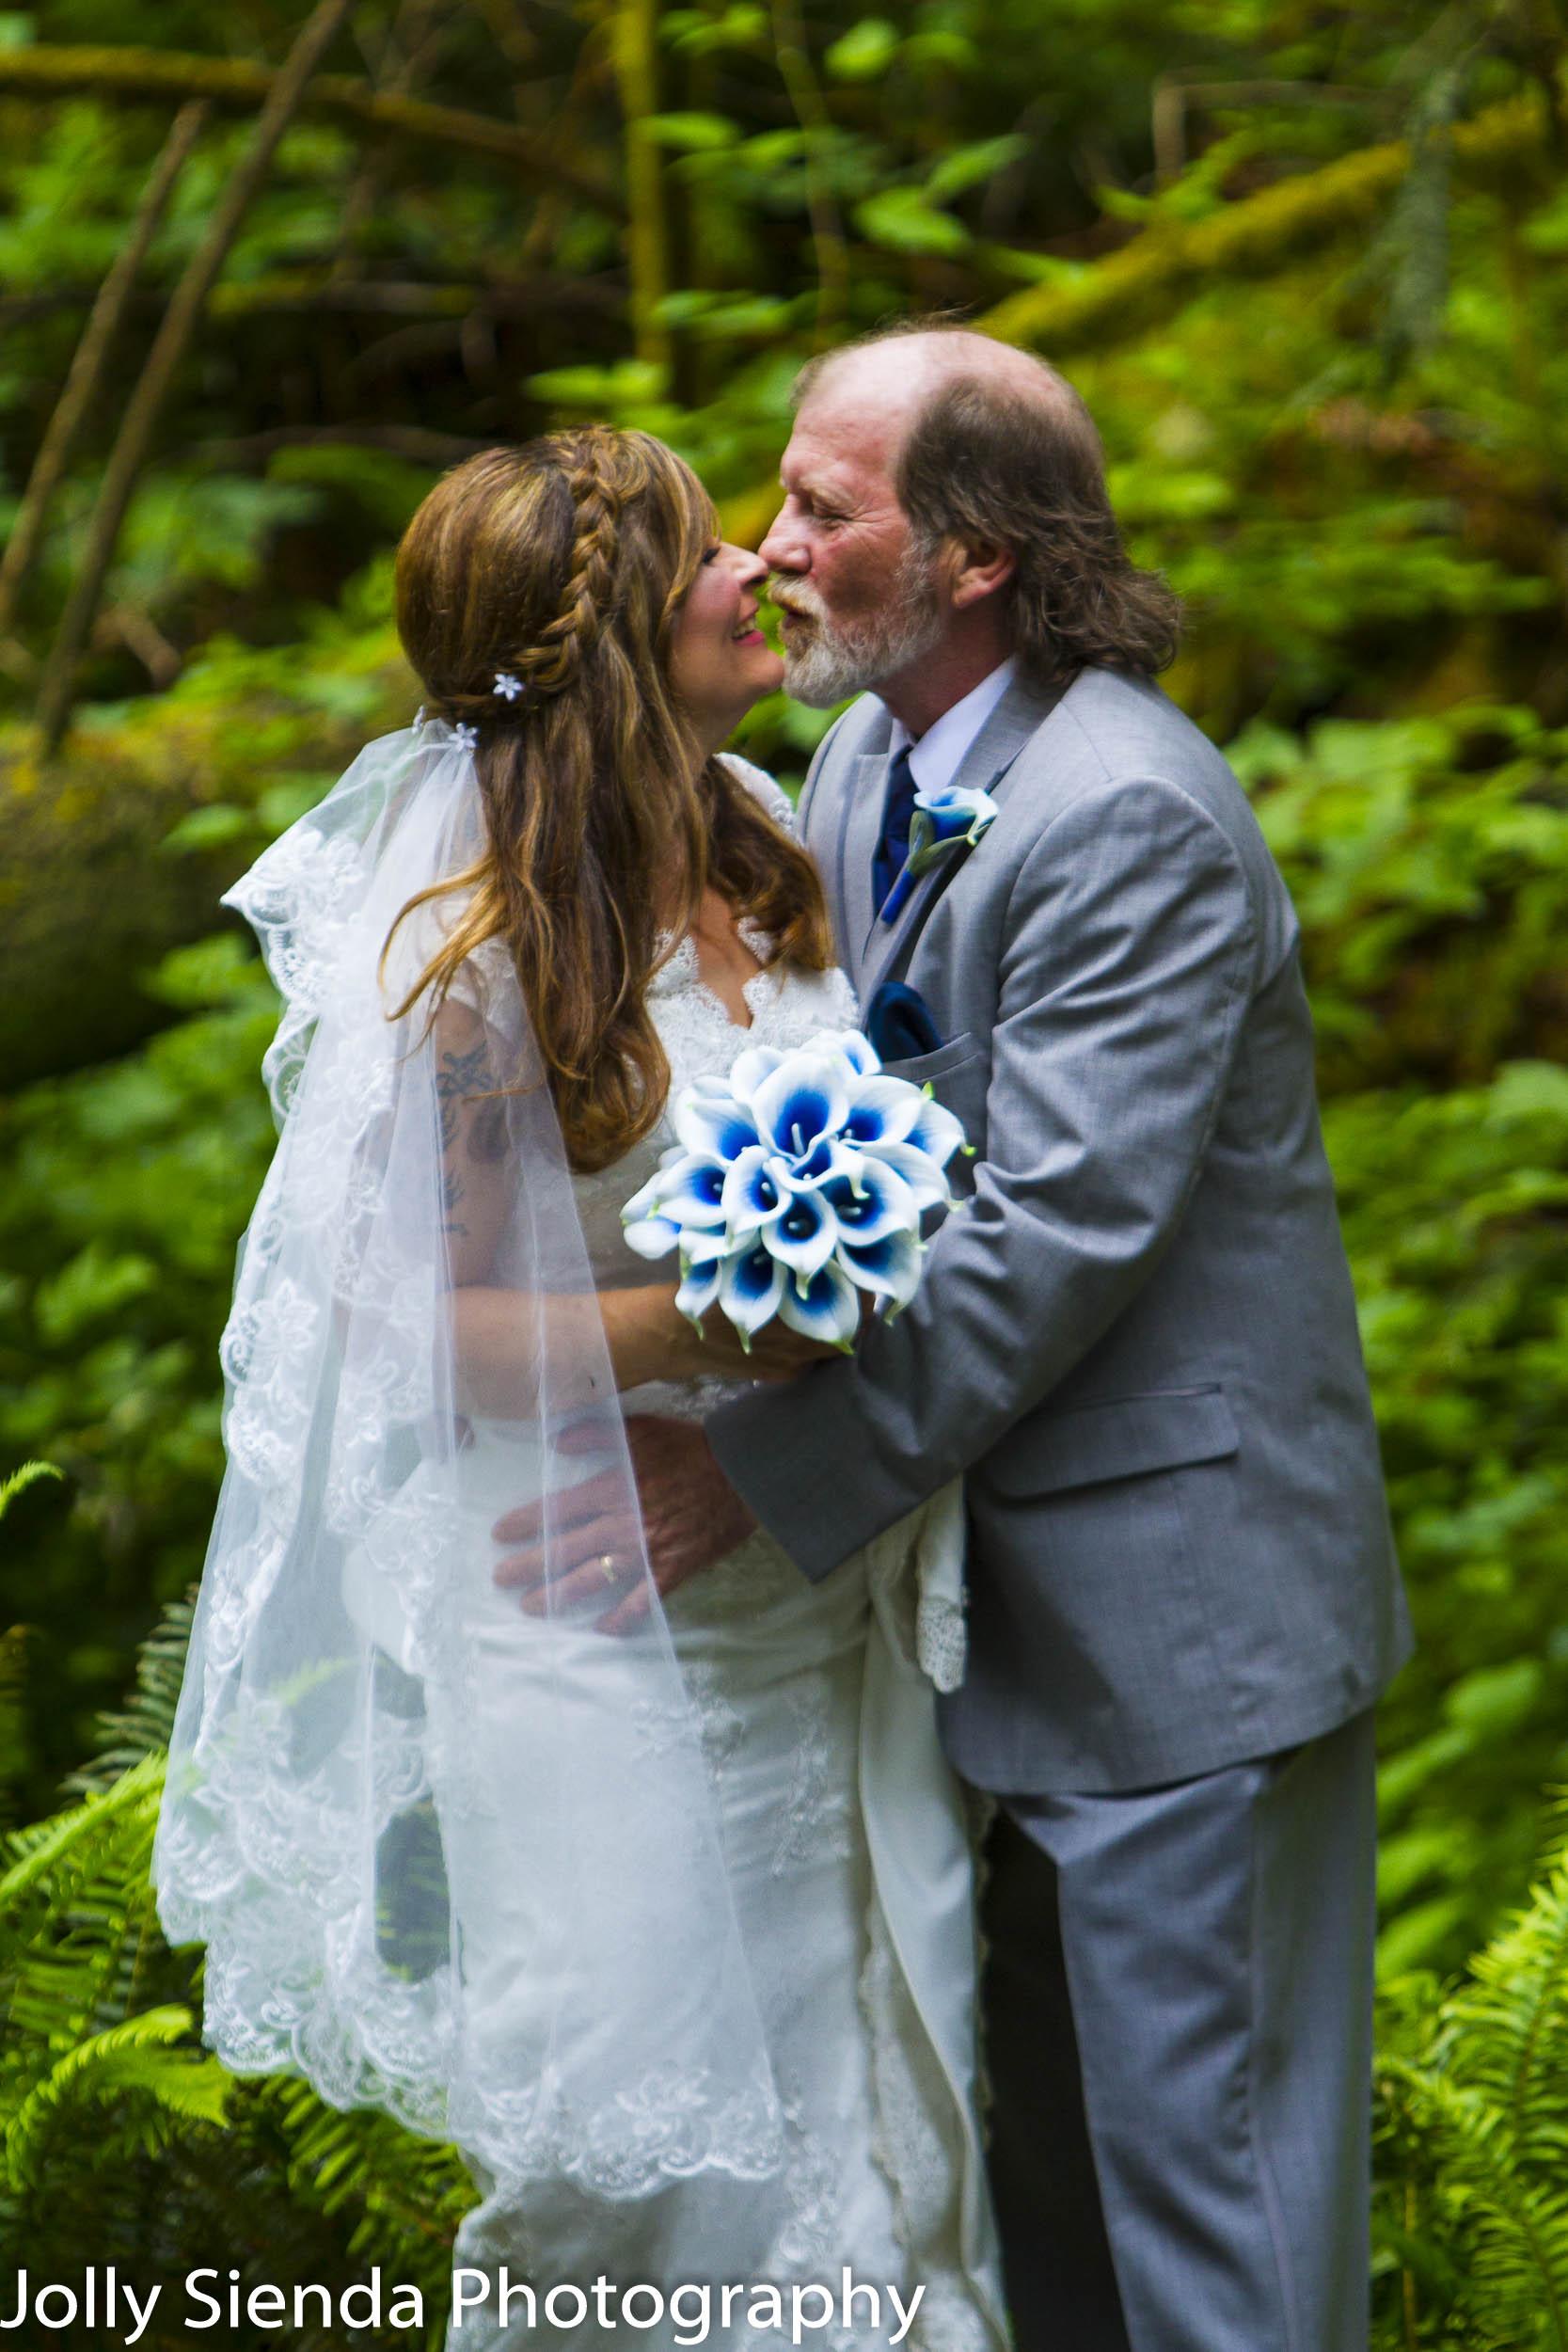 Beautiful bride and groom portrait wedding photography